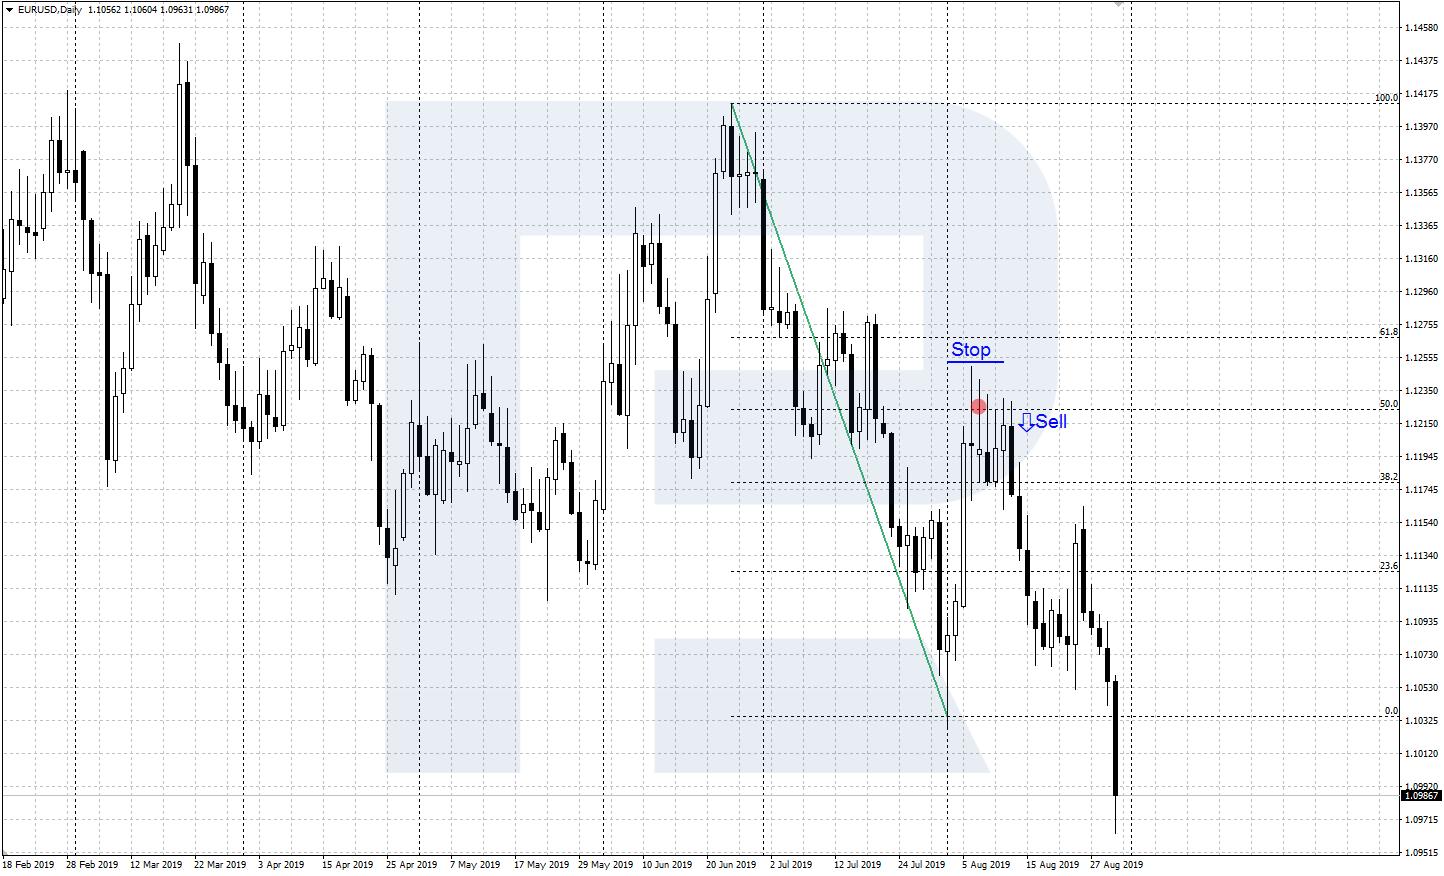 Fibonači līniju stratēģija, izmantojot indikatoru)